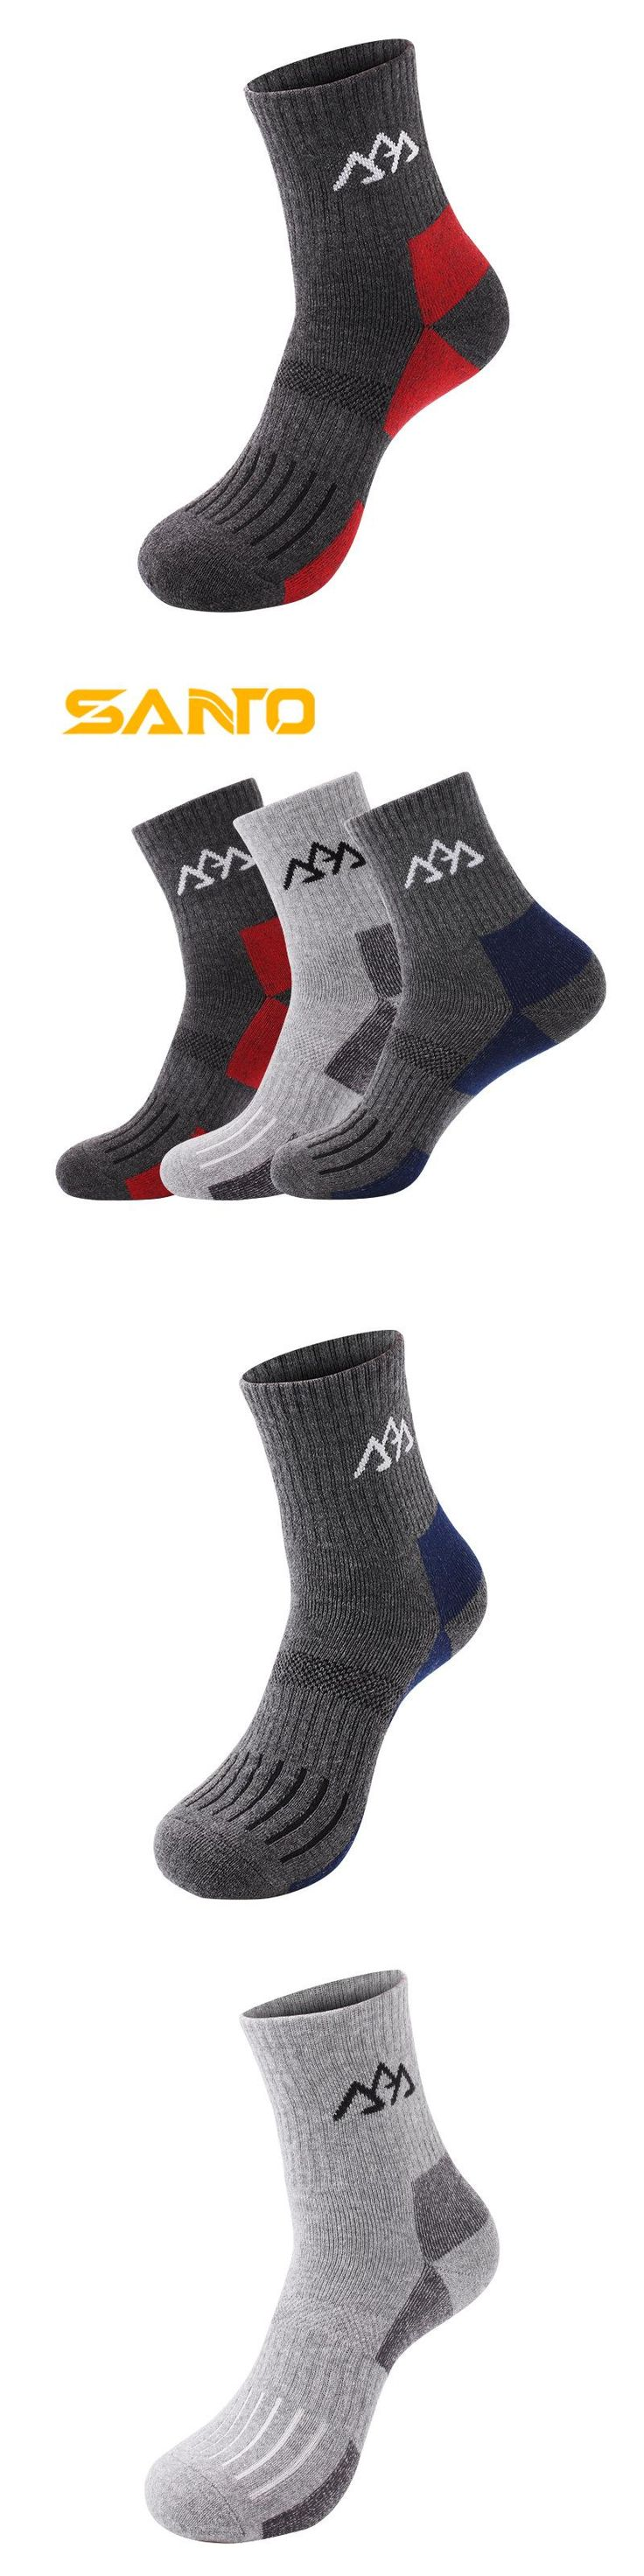 0cd2930e84a6 Calcetines Hombre Top Fashion Men Socks Casual Autumn/winter New  Santo/mountain Full -